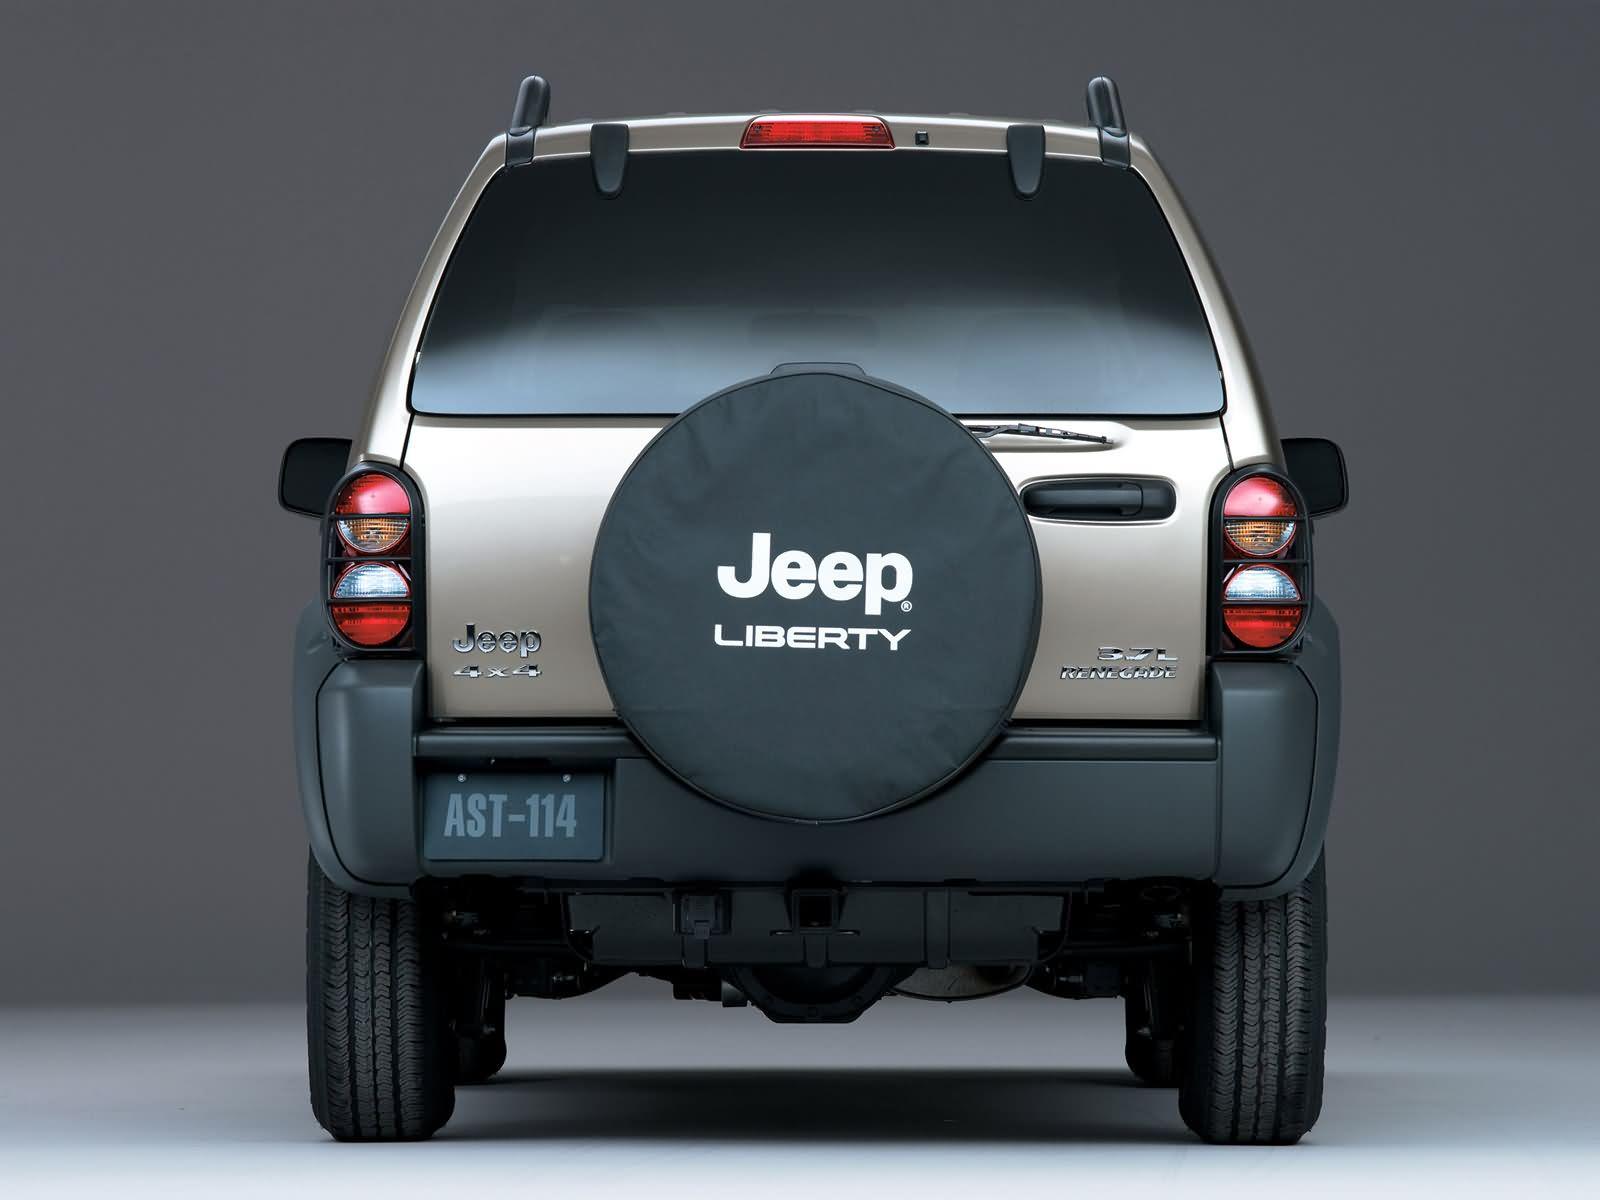 Jeep Liberty photo #7855